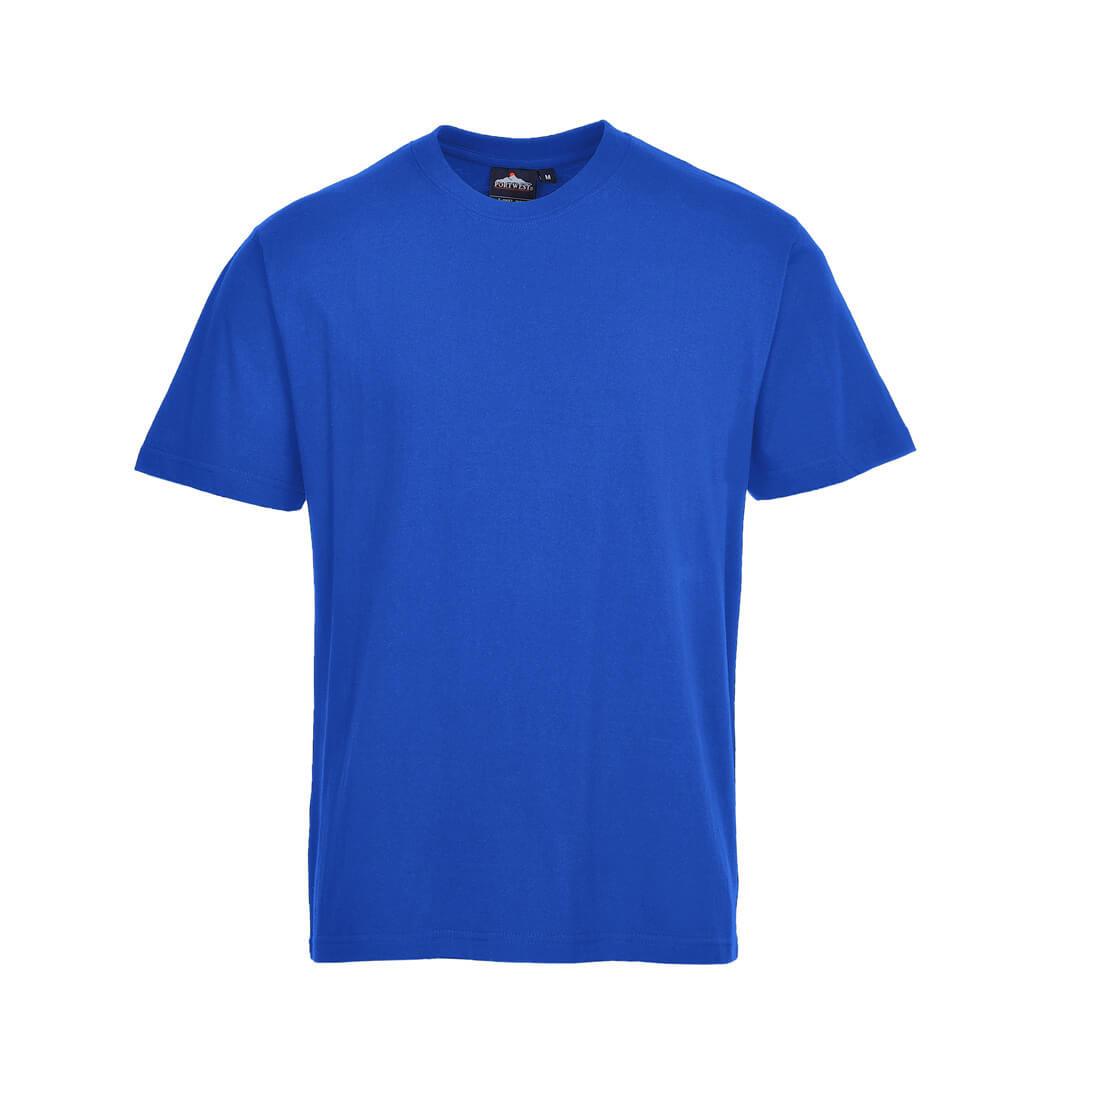 Tricou Premium Turin - Imbracaminte de protectie